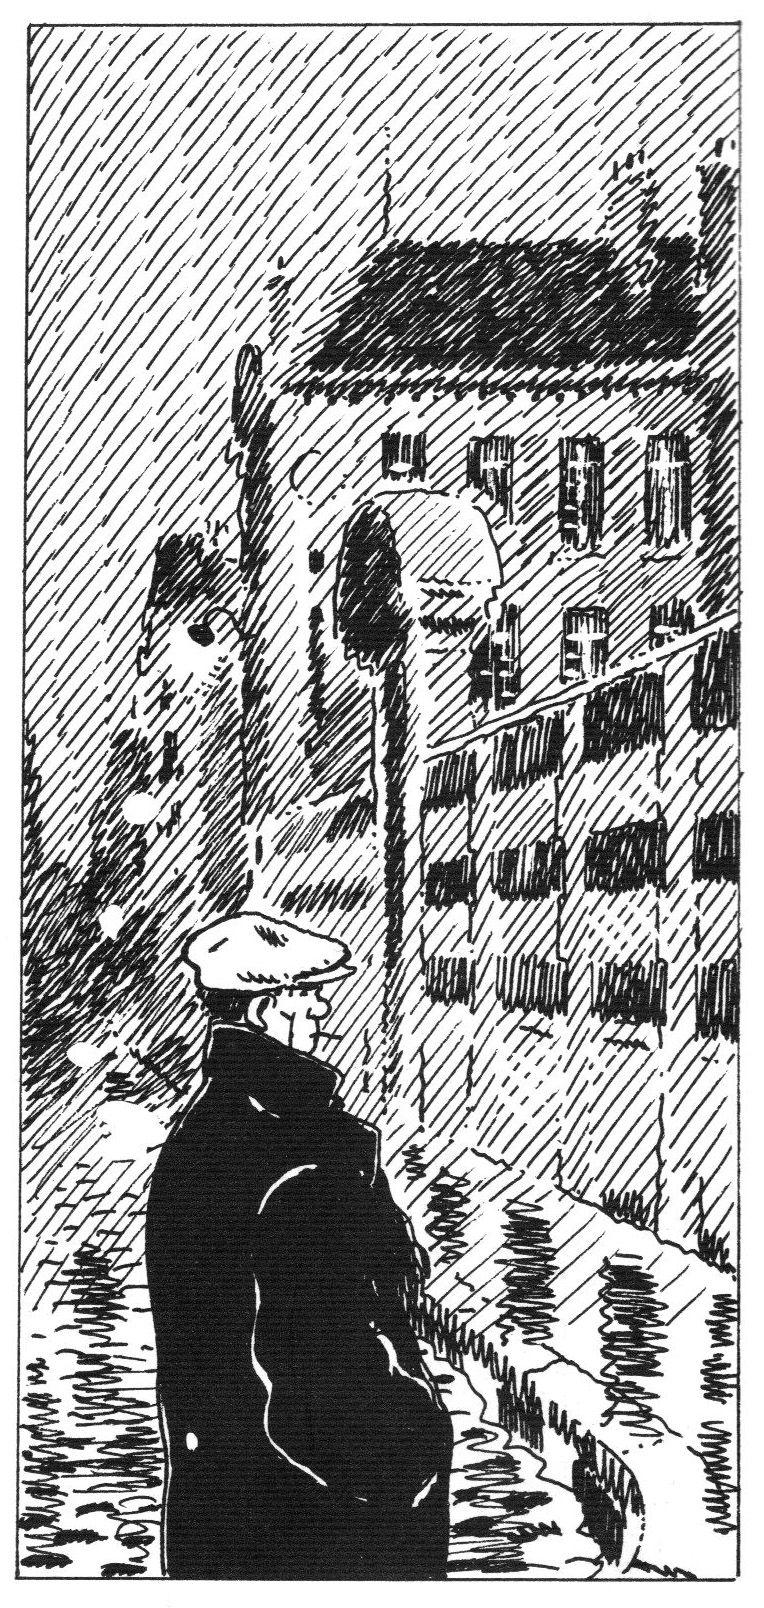 yleiskuva, huomaa viivavarjostus, Jacques Tardi